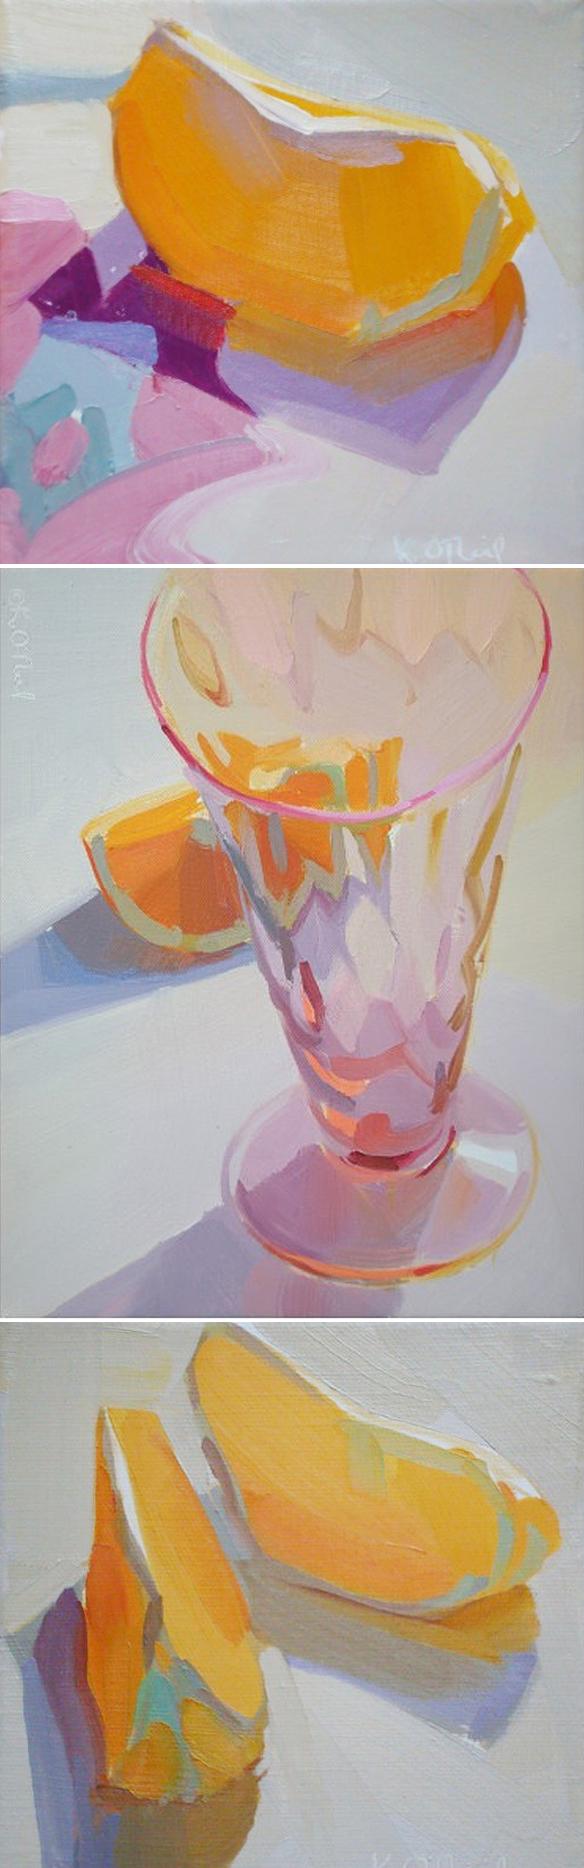 karen oneil peinture quartiers d'orange fraicheur